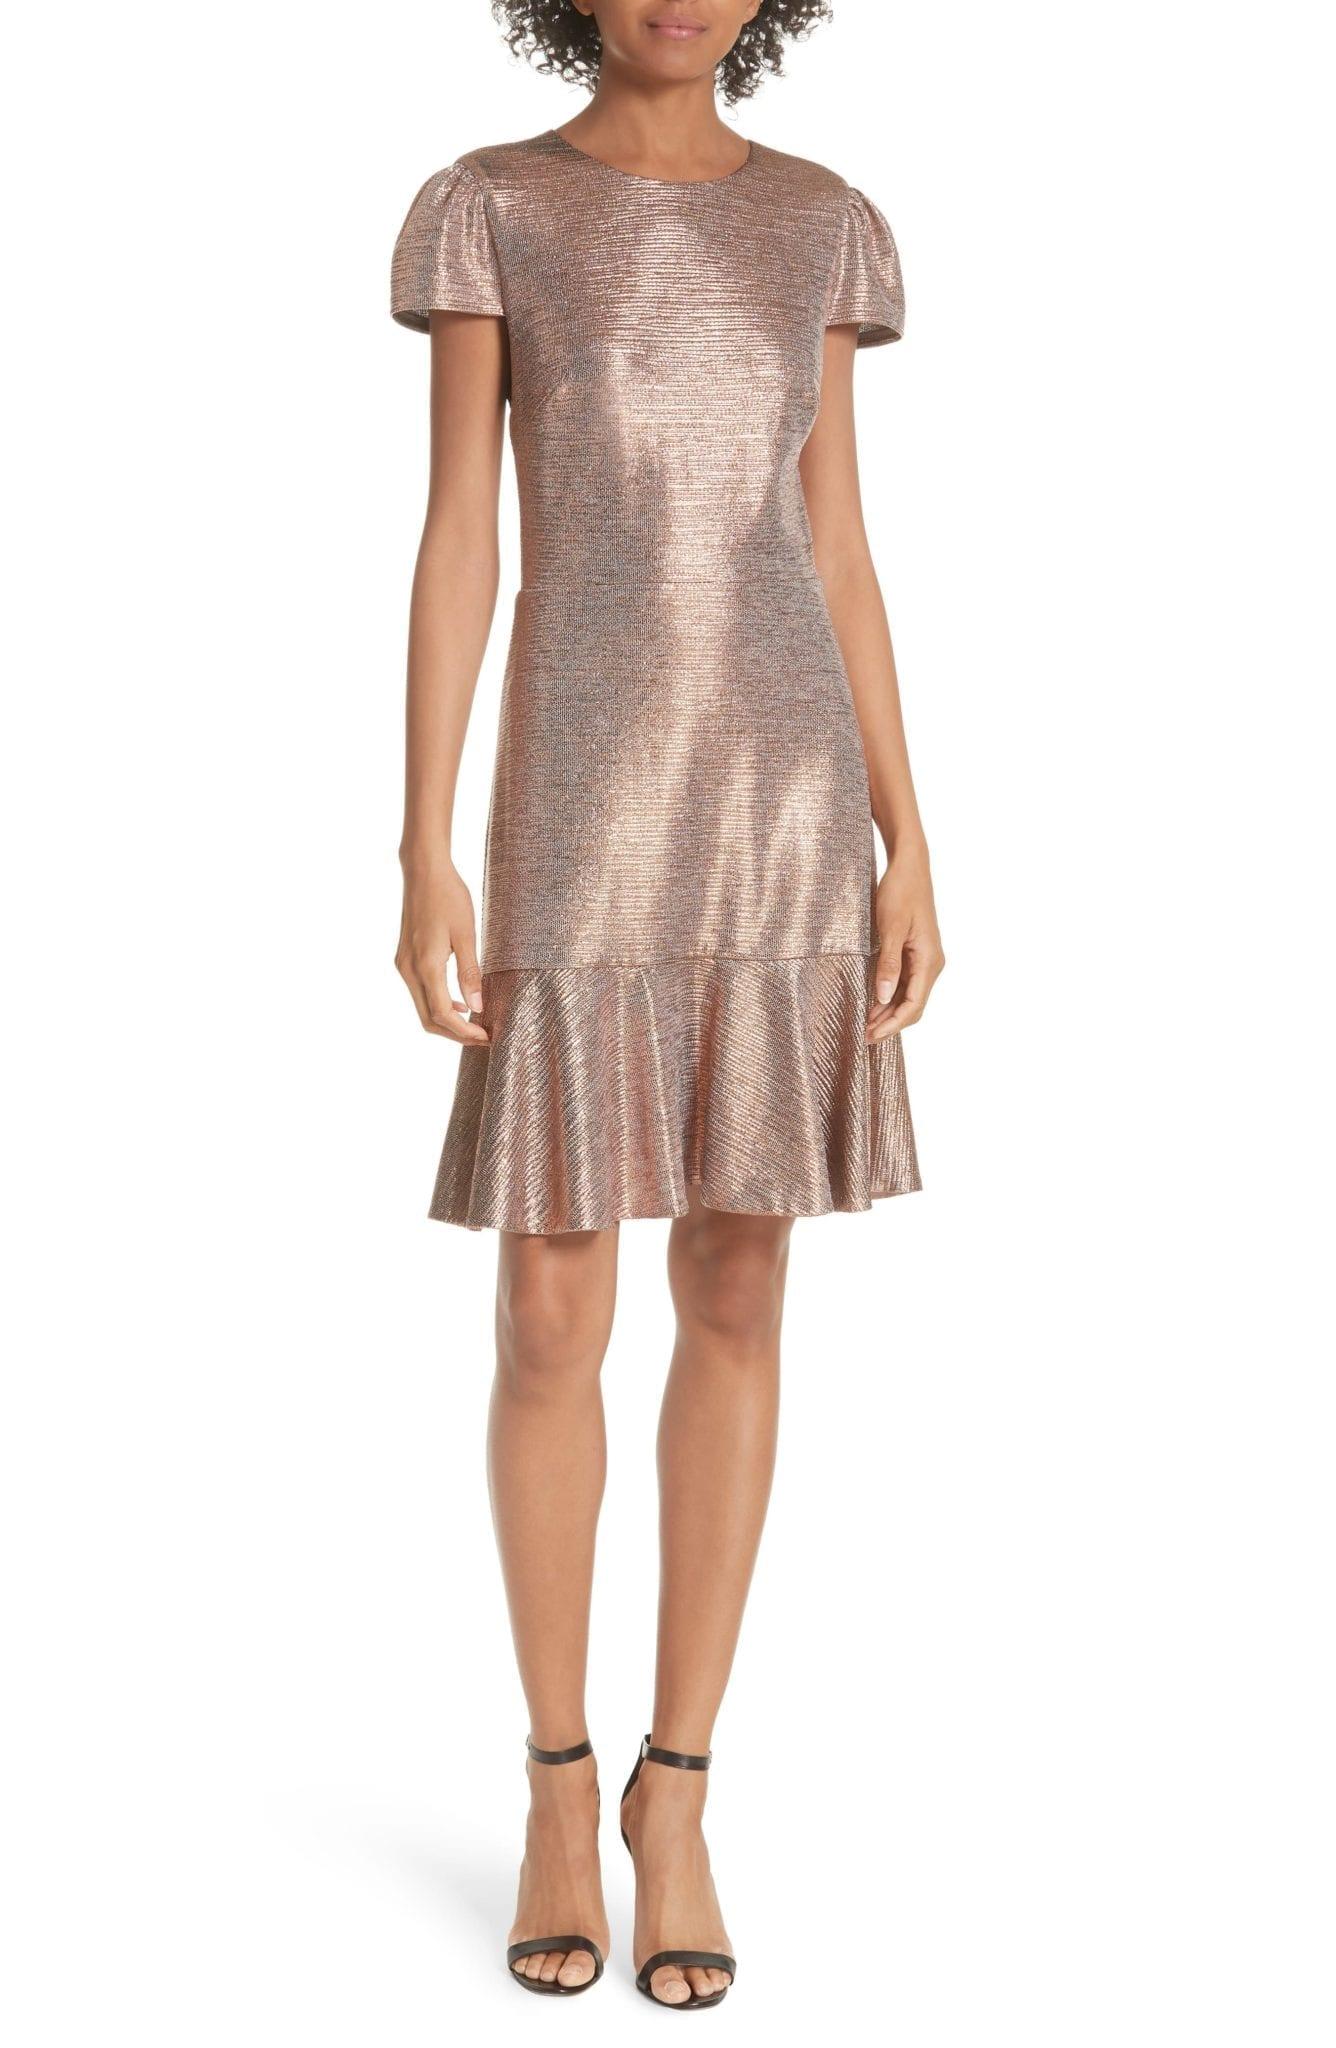 ALICE + OLIVIA Imani Ruffle Hem Metallic Textured Gold Dress